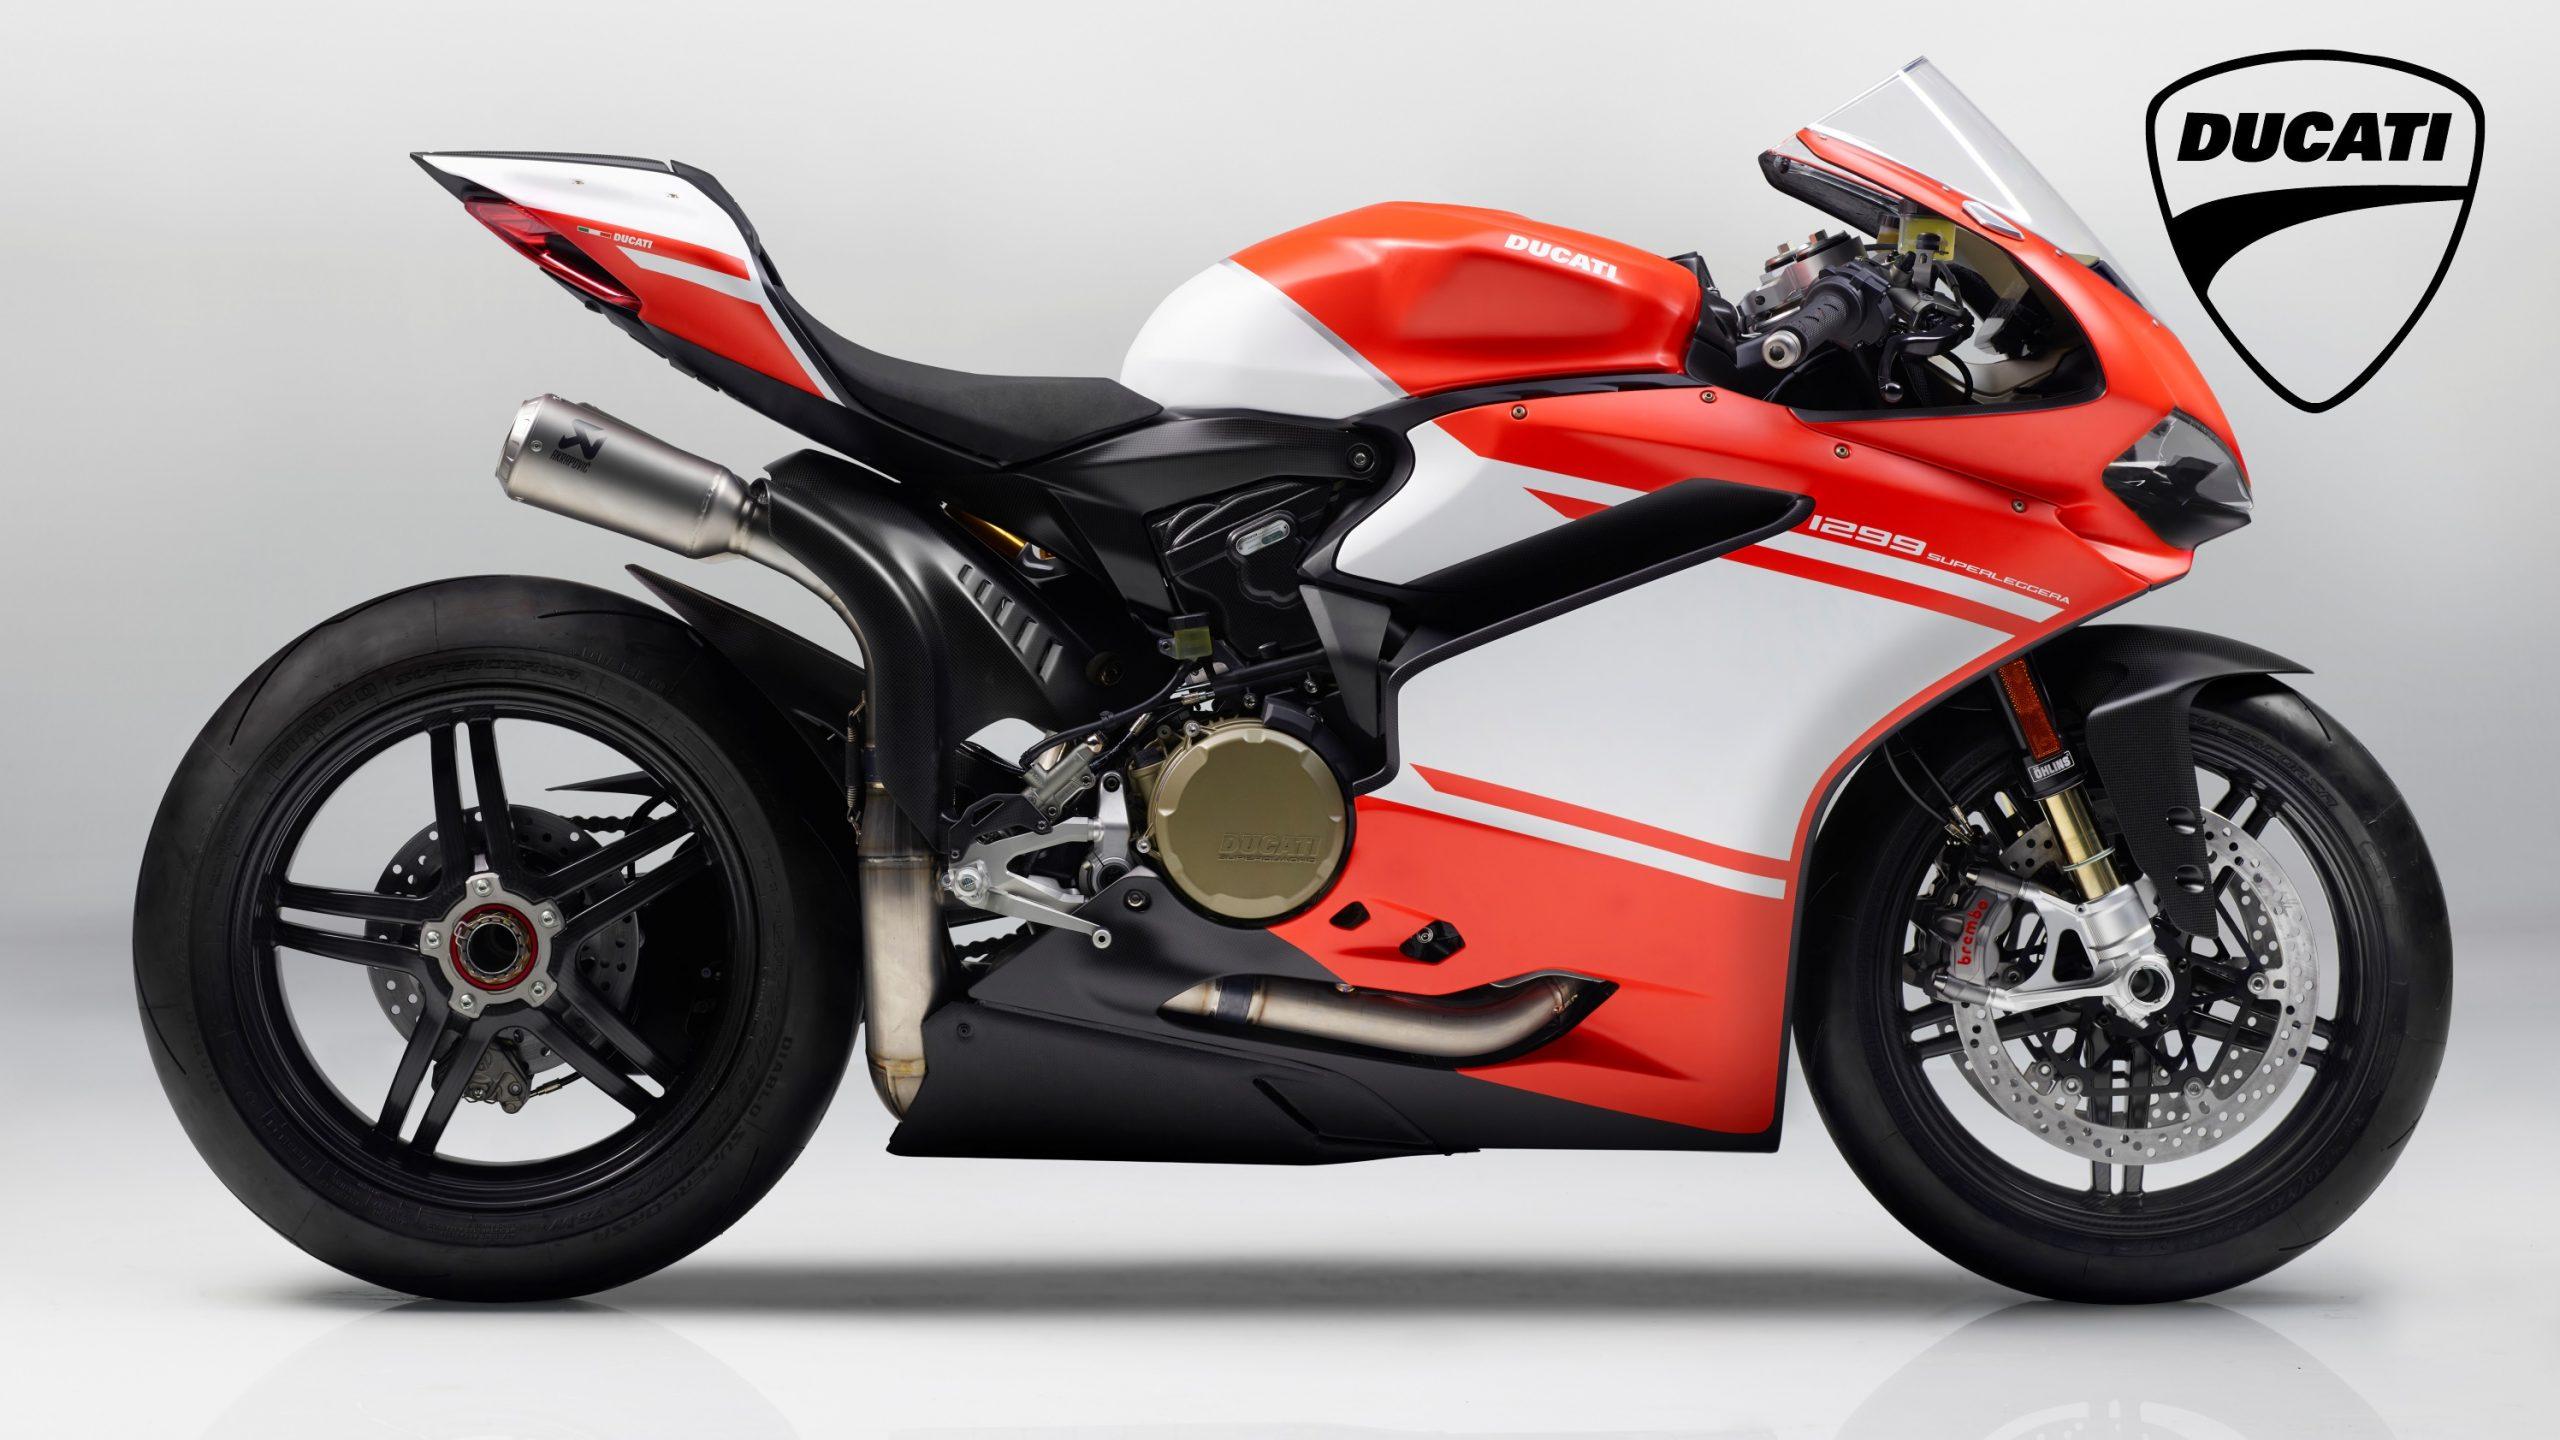 2017 Ducati 1299 Superleggera Side View